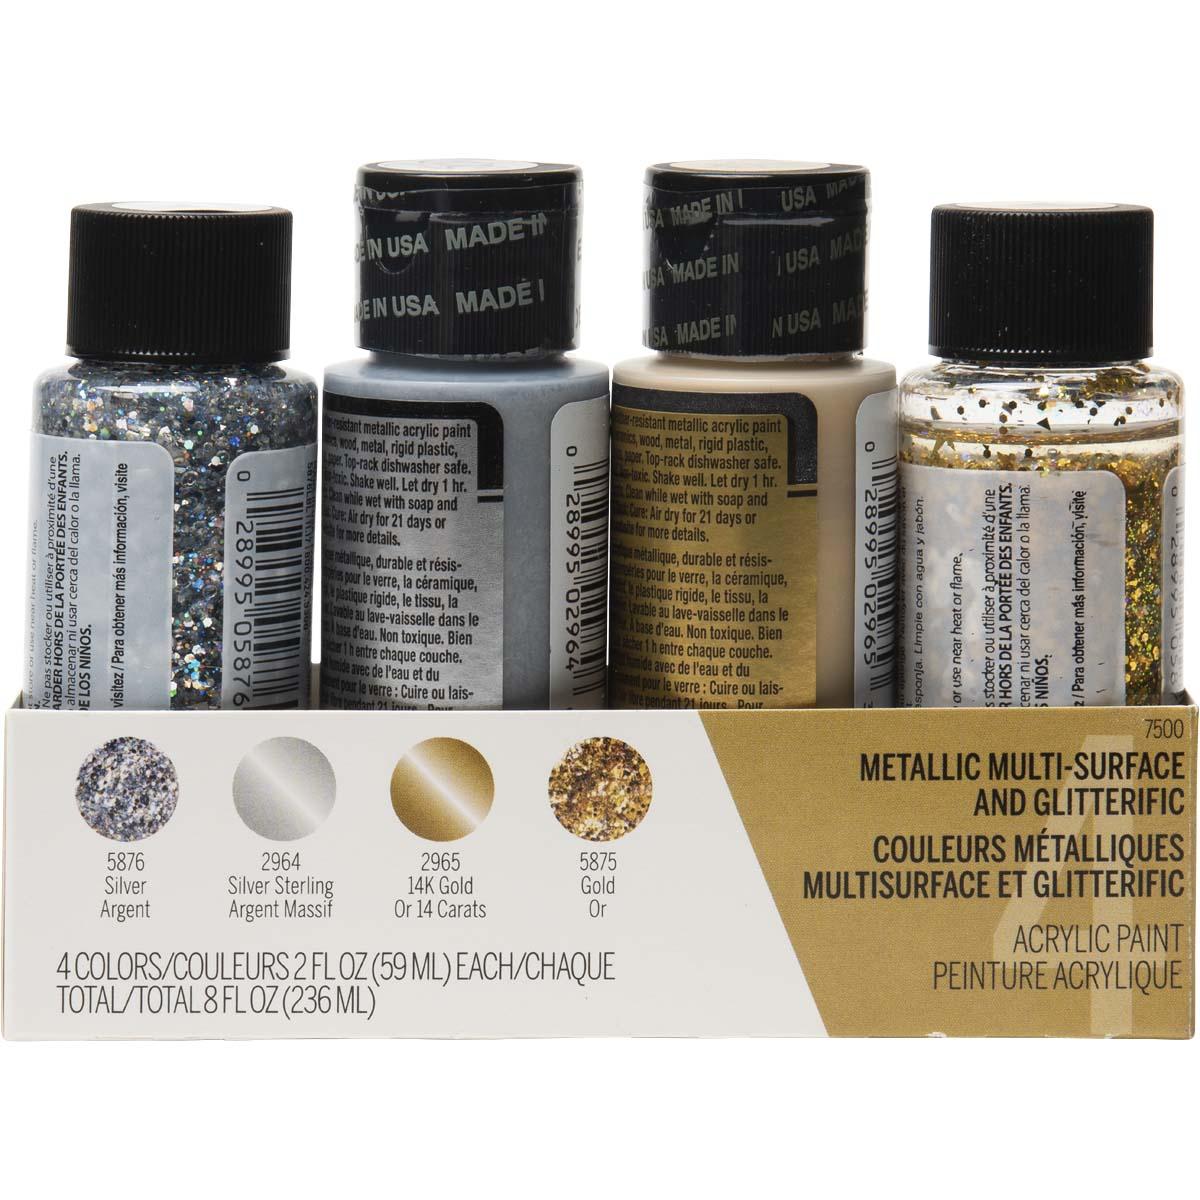 FolkArt ® Multi-Surface Metallic and Glitterific™ Paint Set 4 Color - 7500